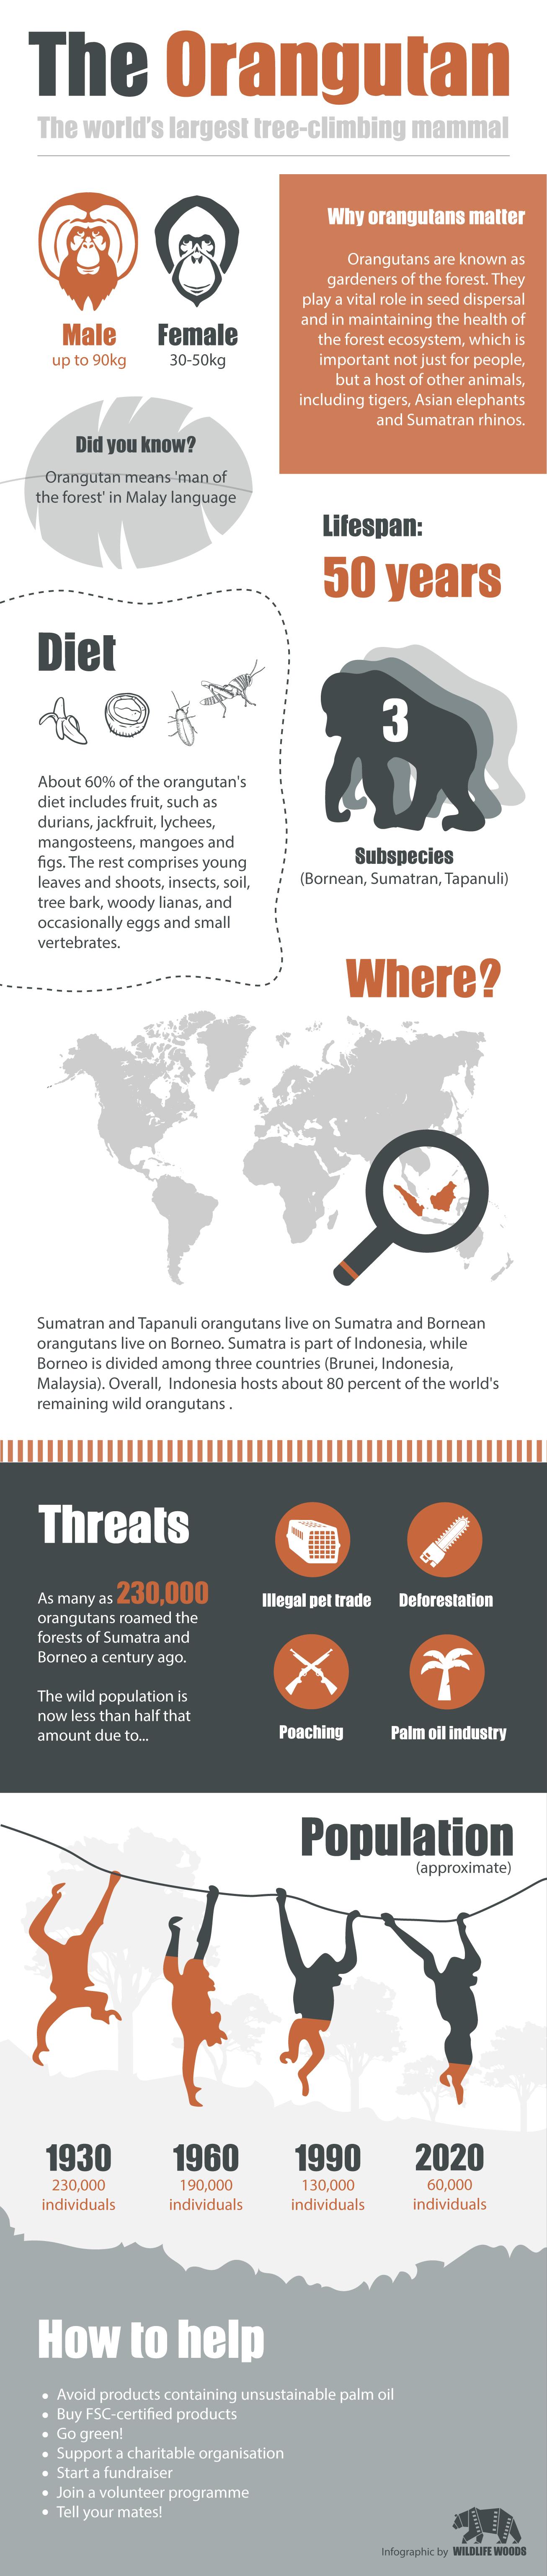 Orangutan-Infographic.jpg